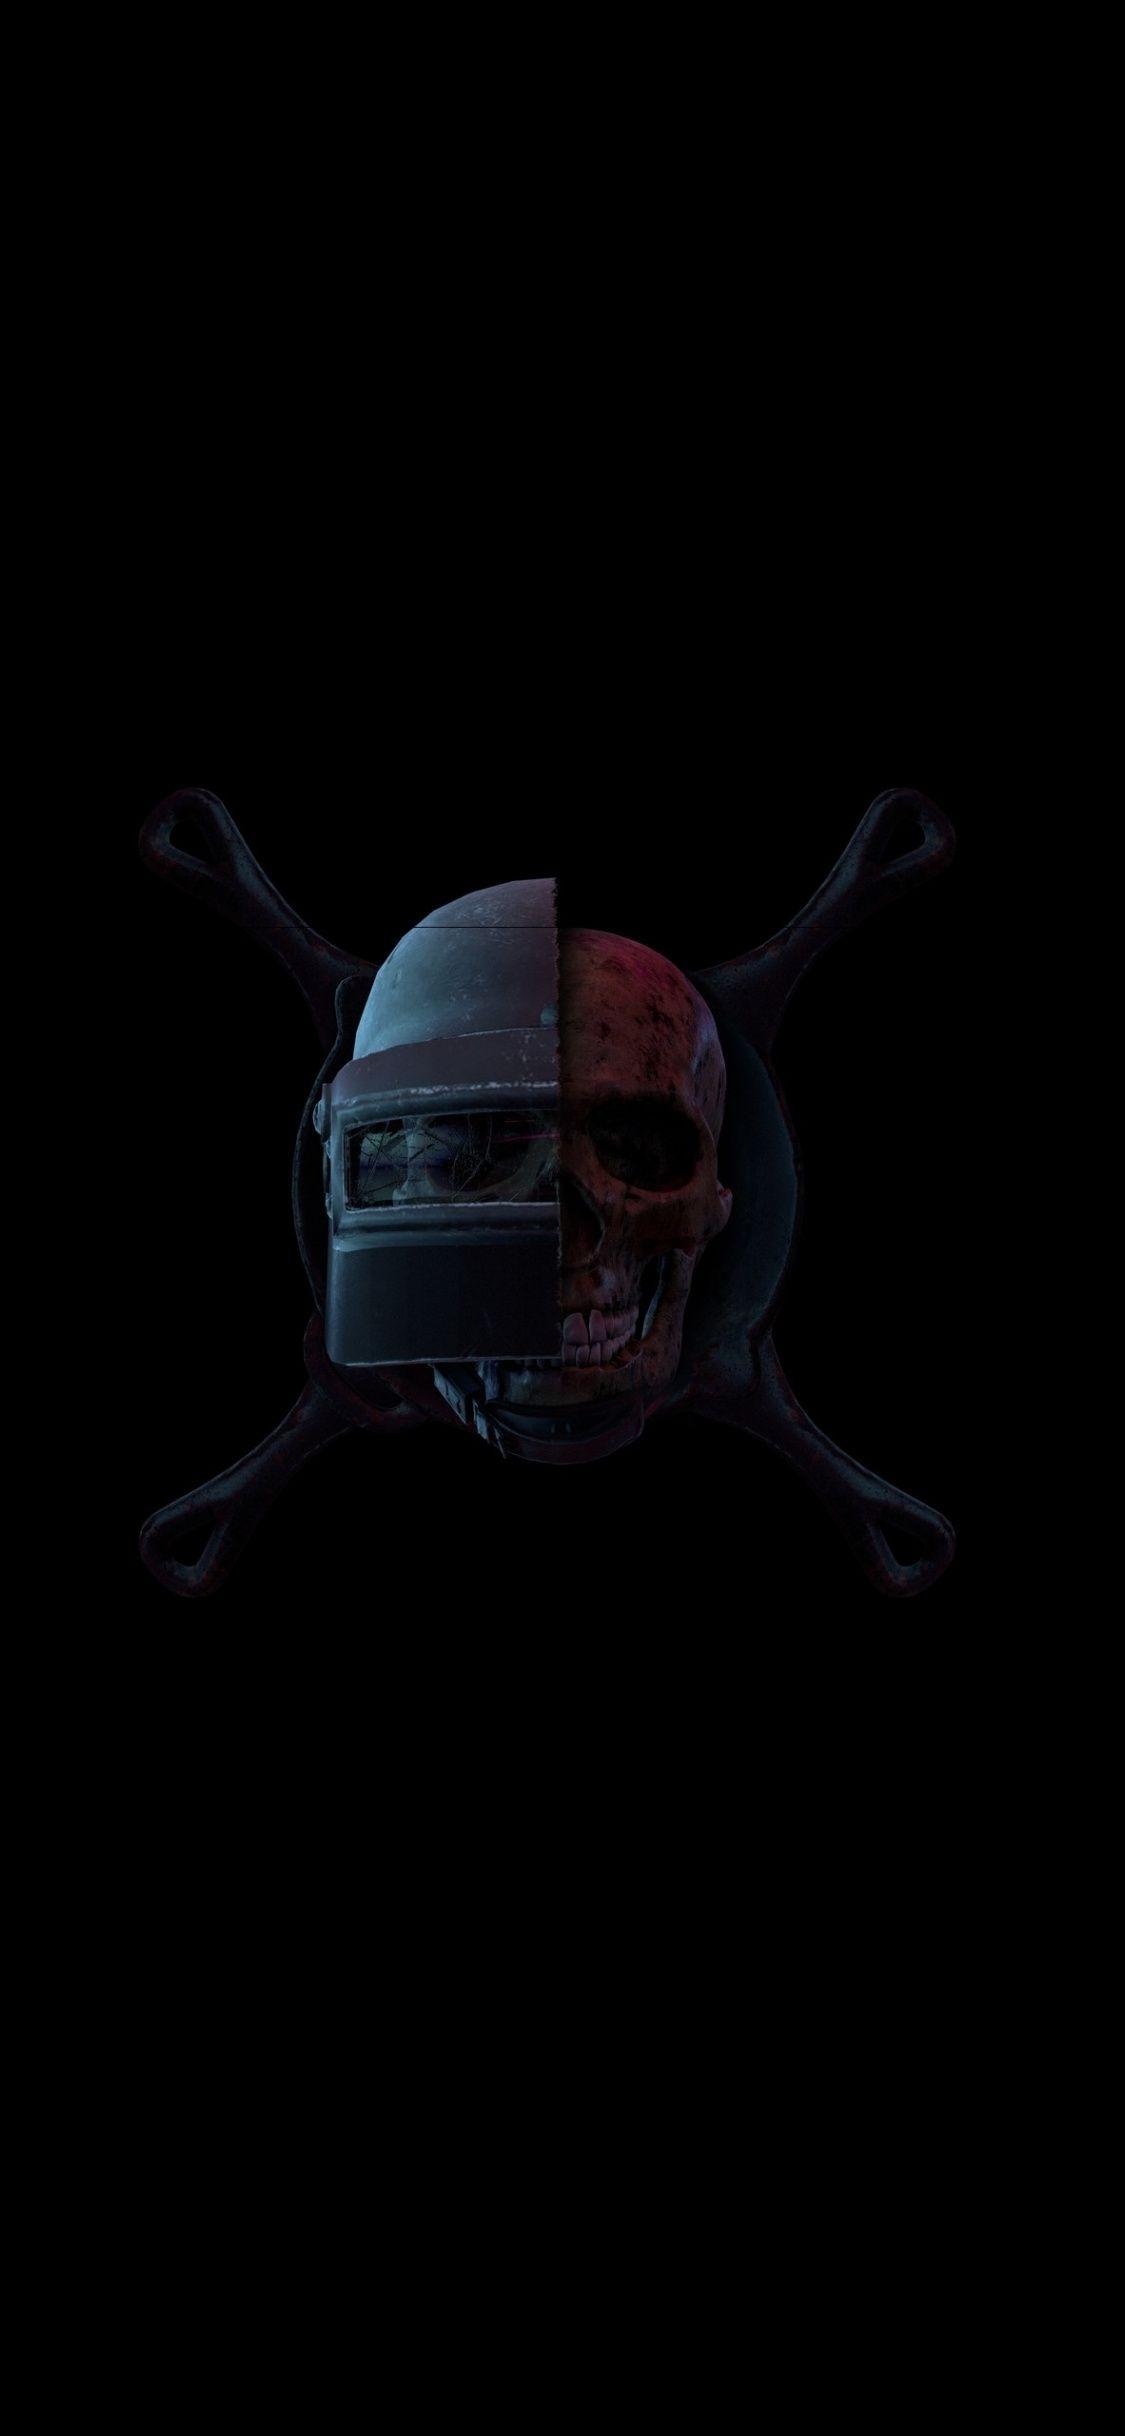 Helmet Skull Cooking Pan Pubg Artwork 1125x2436 Wallpaper